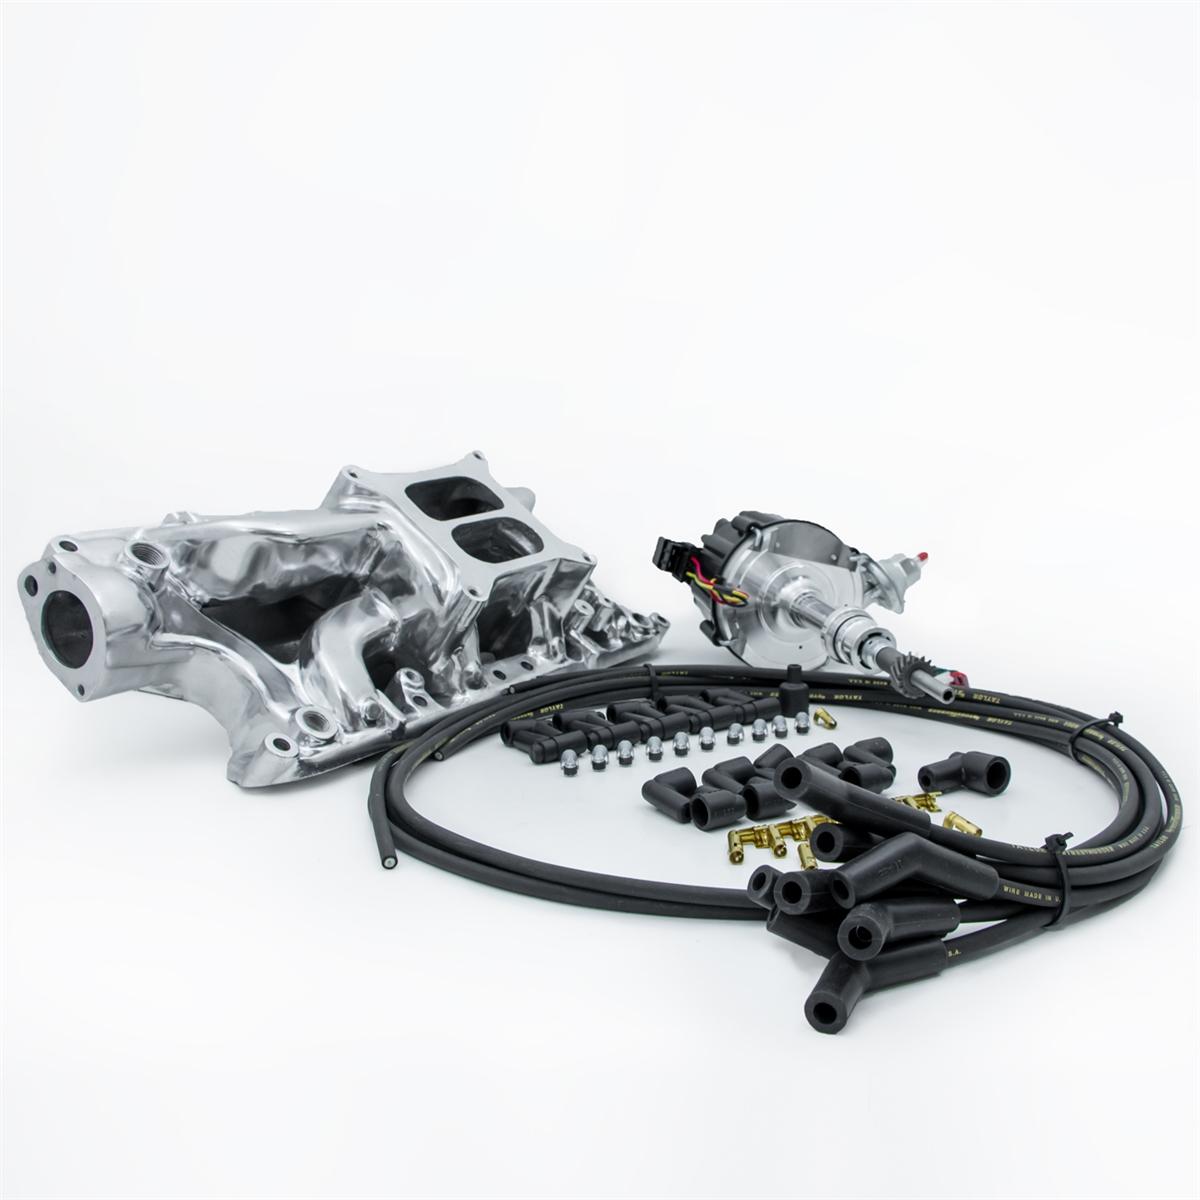 Ford 302 Carb Wiring Harness Electrical Diagrams Mustang 5 0 Liter Cid Conversion Kit Efi To Intake Fog Light